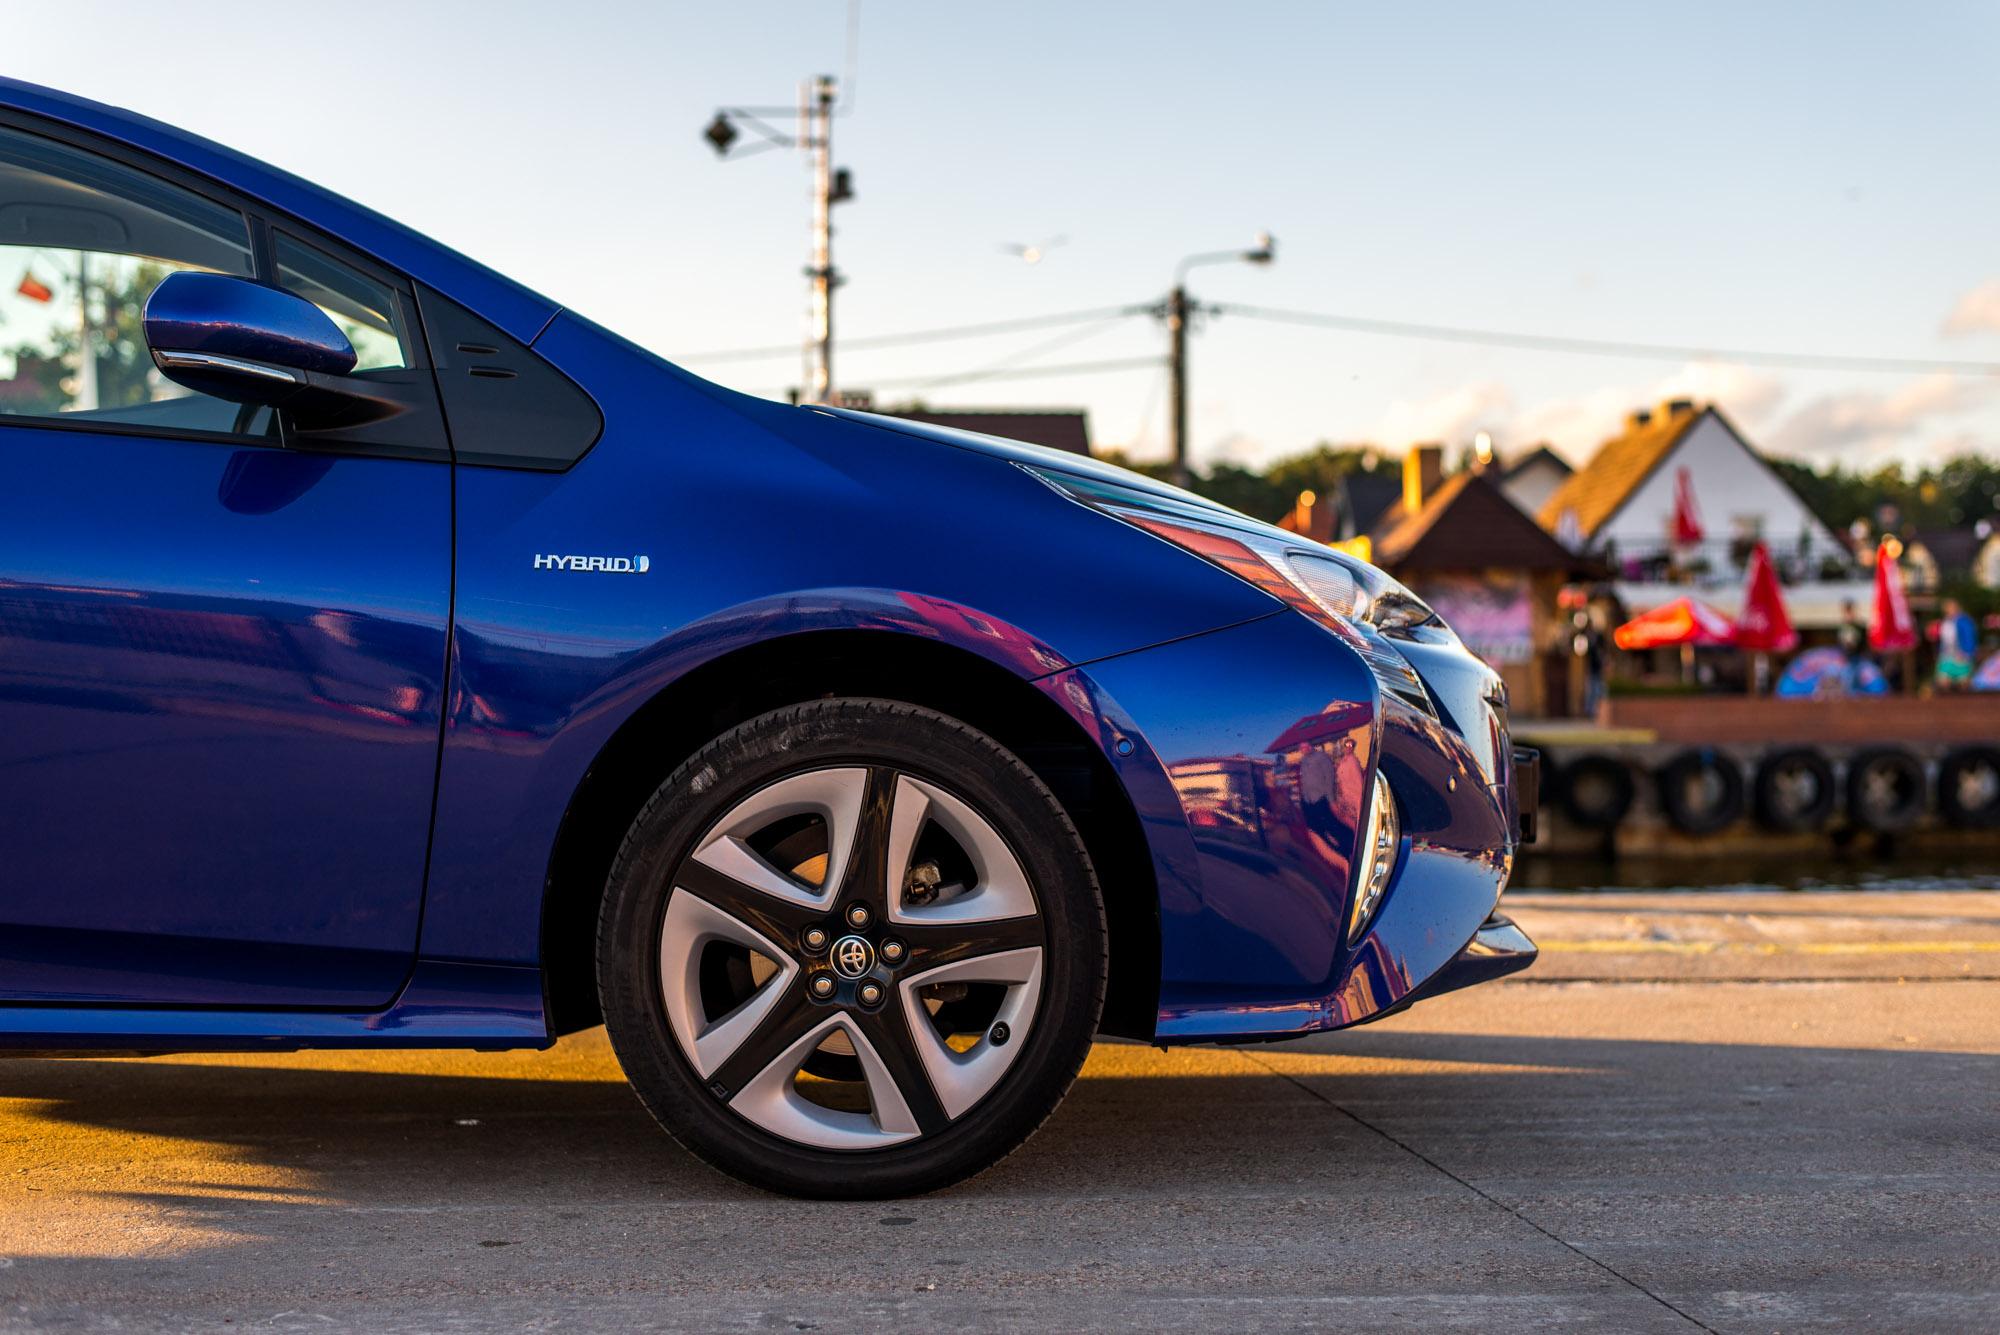 Toyota-Prius-day1-7